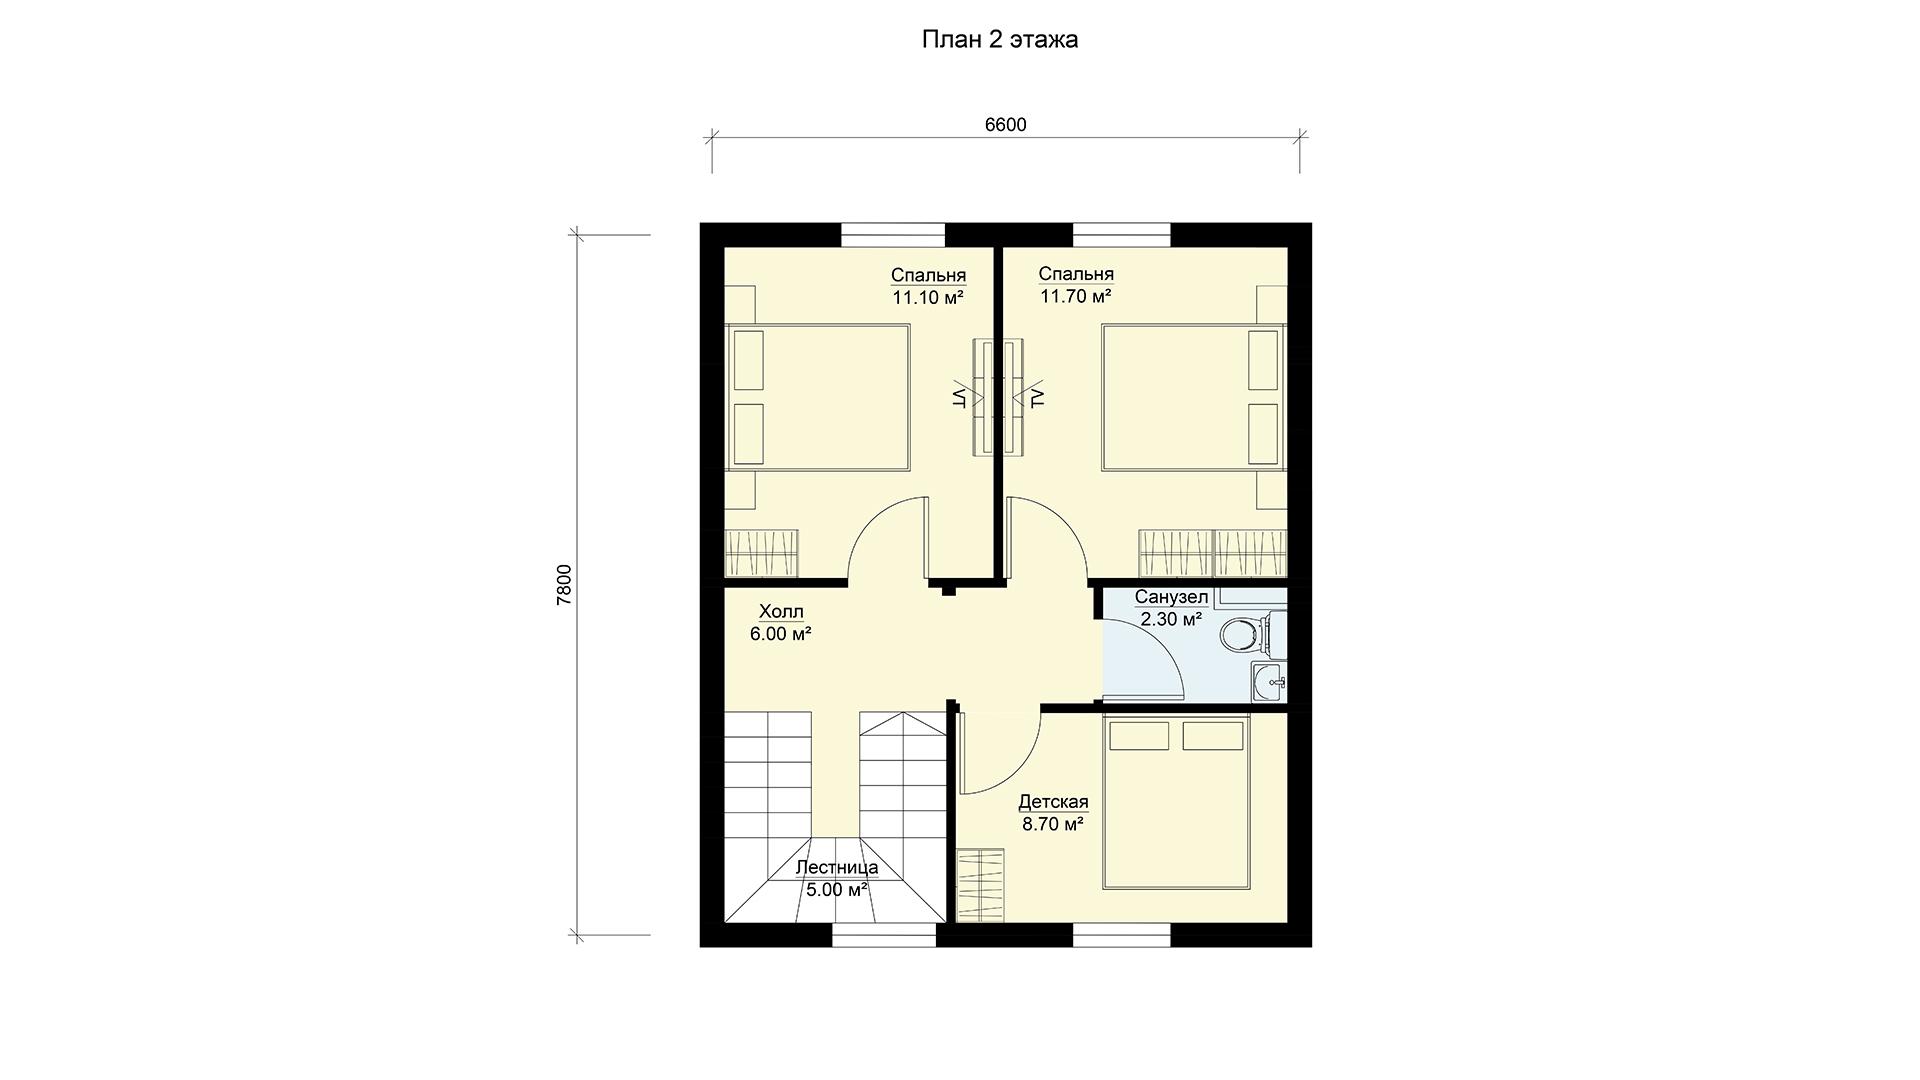 План мансардного этажа небольшого двухэтажного дома, проект БЭНПАН МС-92.